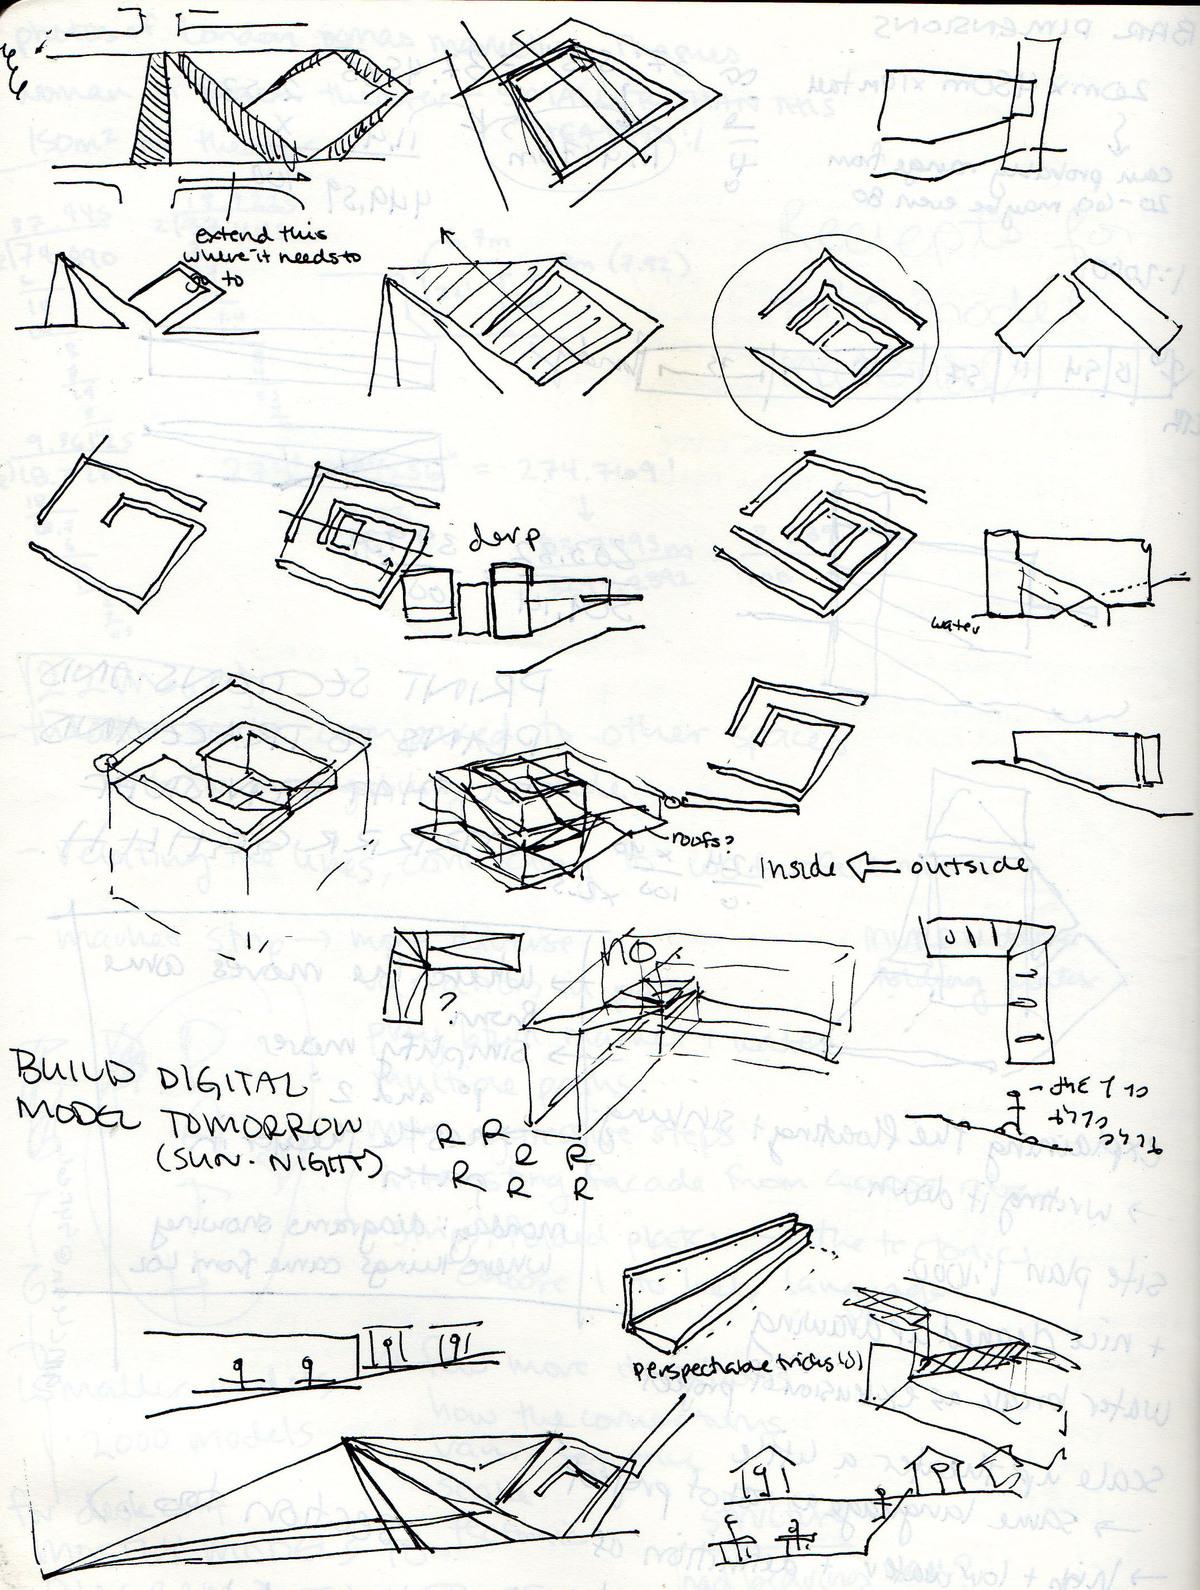 diagrammatic sketches